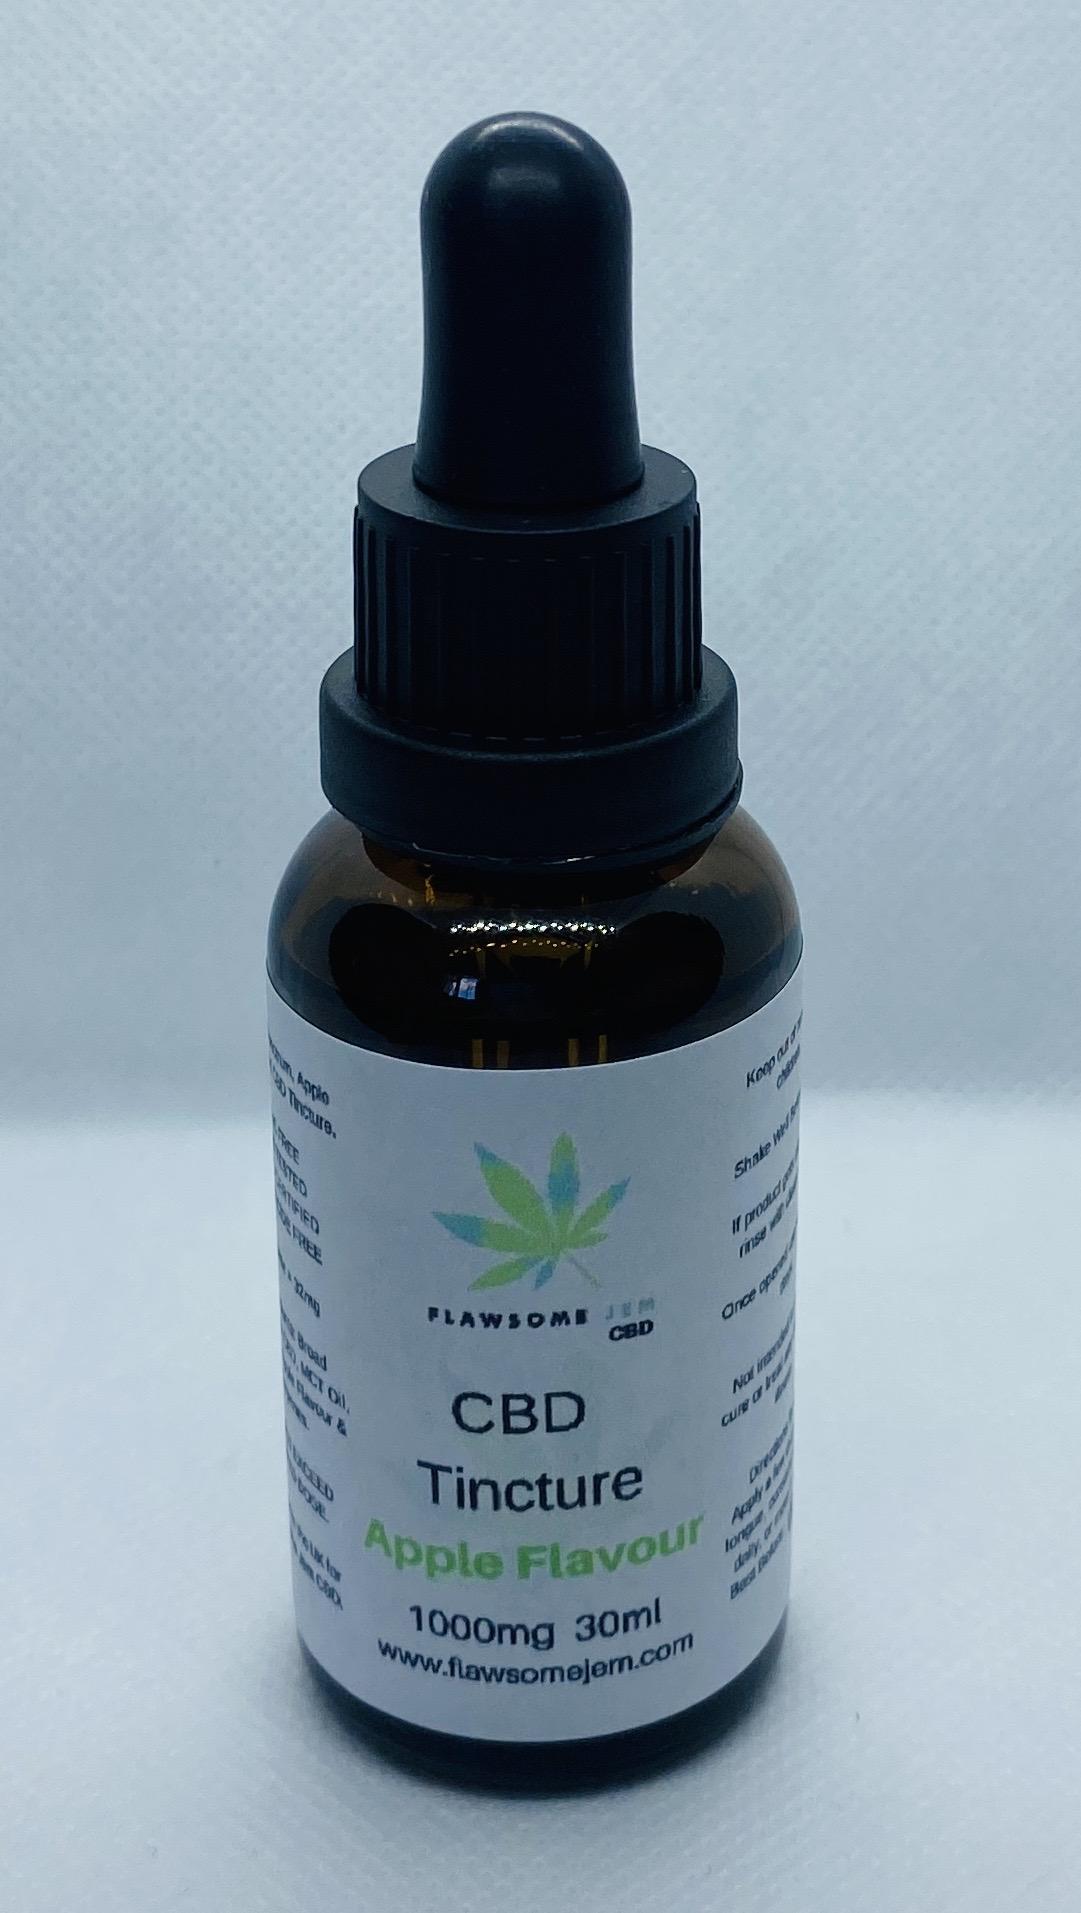 Broad Spectrum CBD Tincture, Apple Flavour, 1000mg / 3%, 30ml